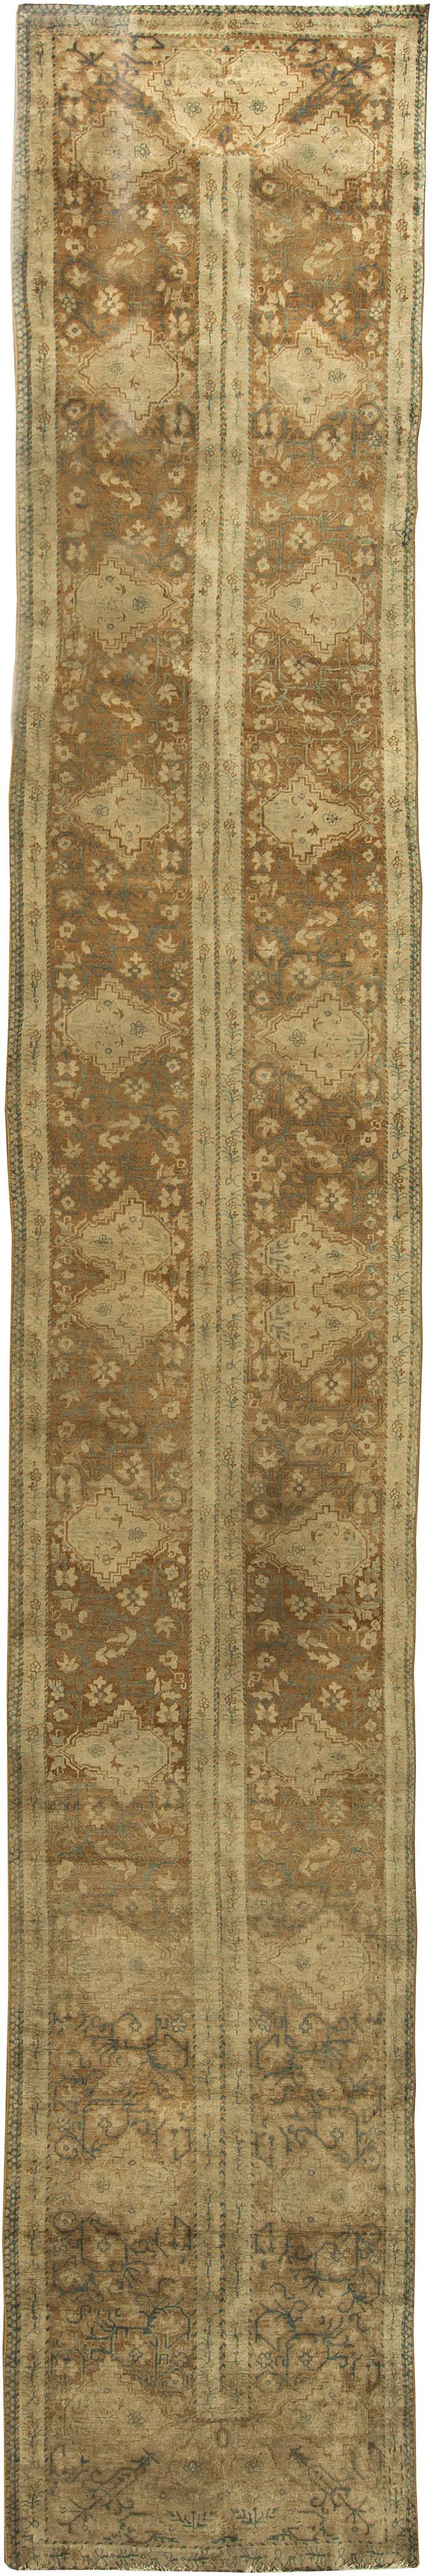 Antique Indian runner fragment BB4109